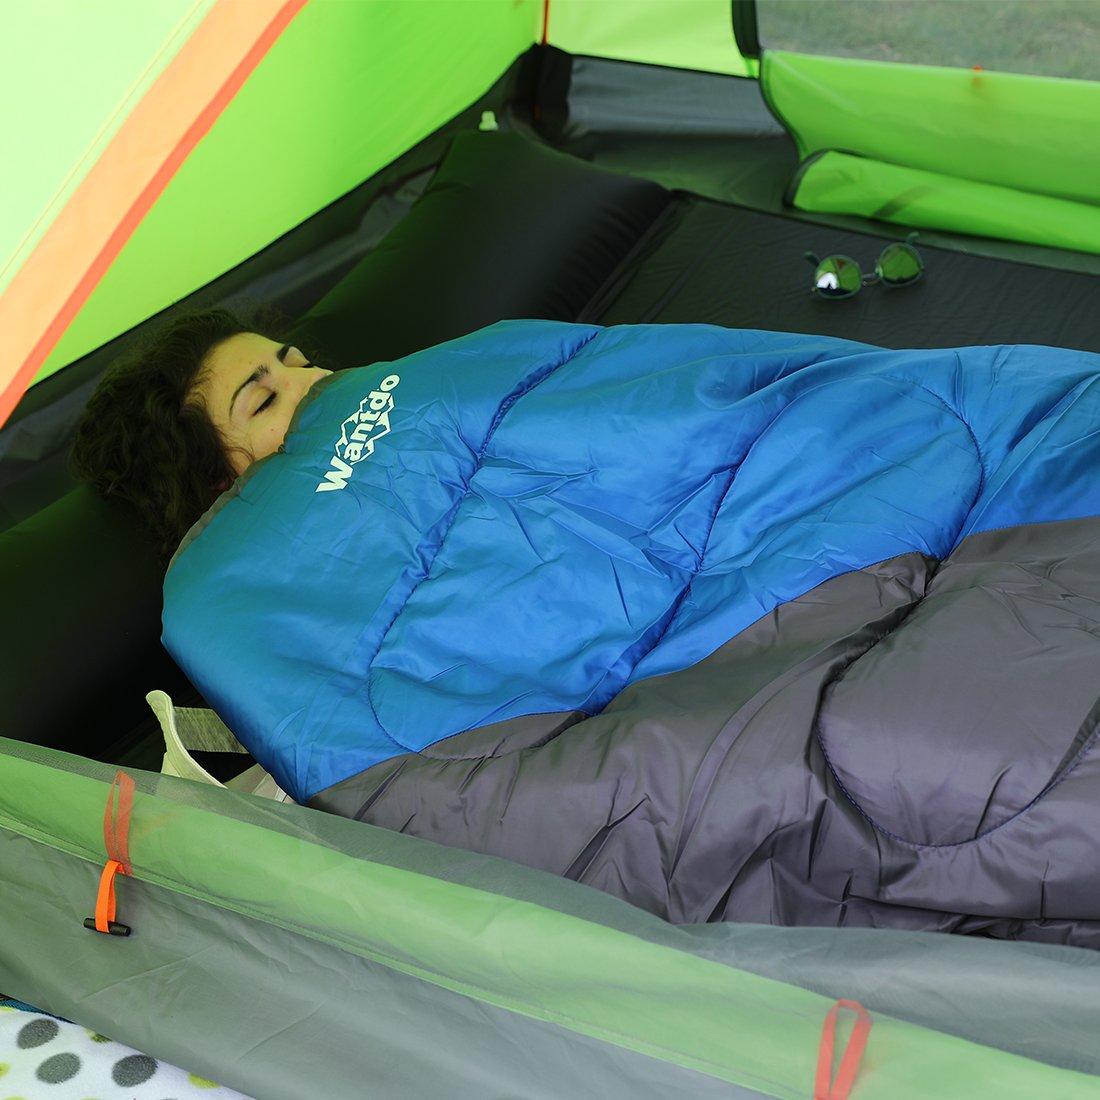 Ligero Wantdo Saco de dormir Interiores y Exteriores Impermeable Port/átil